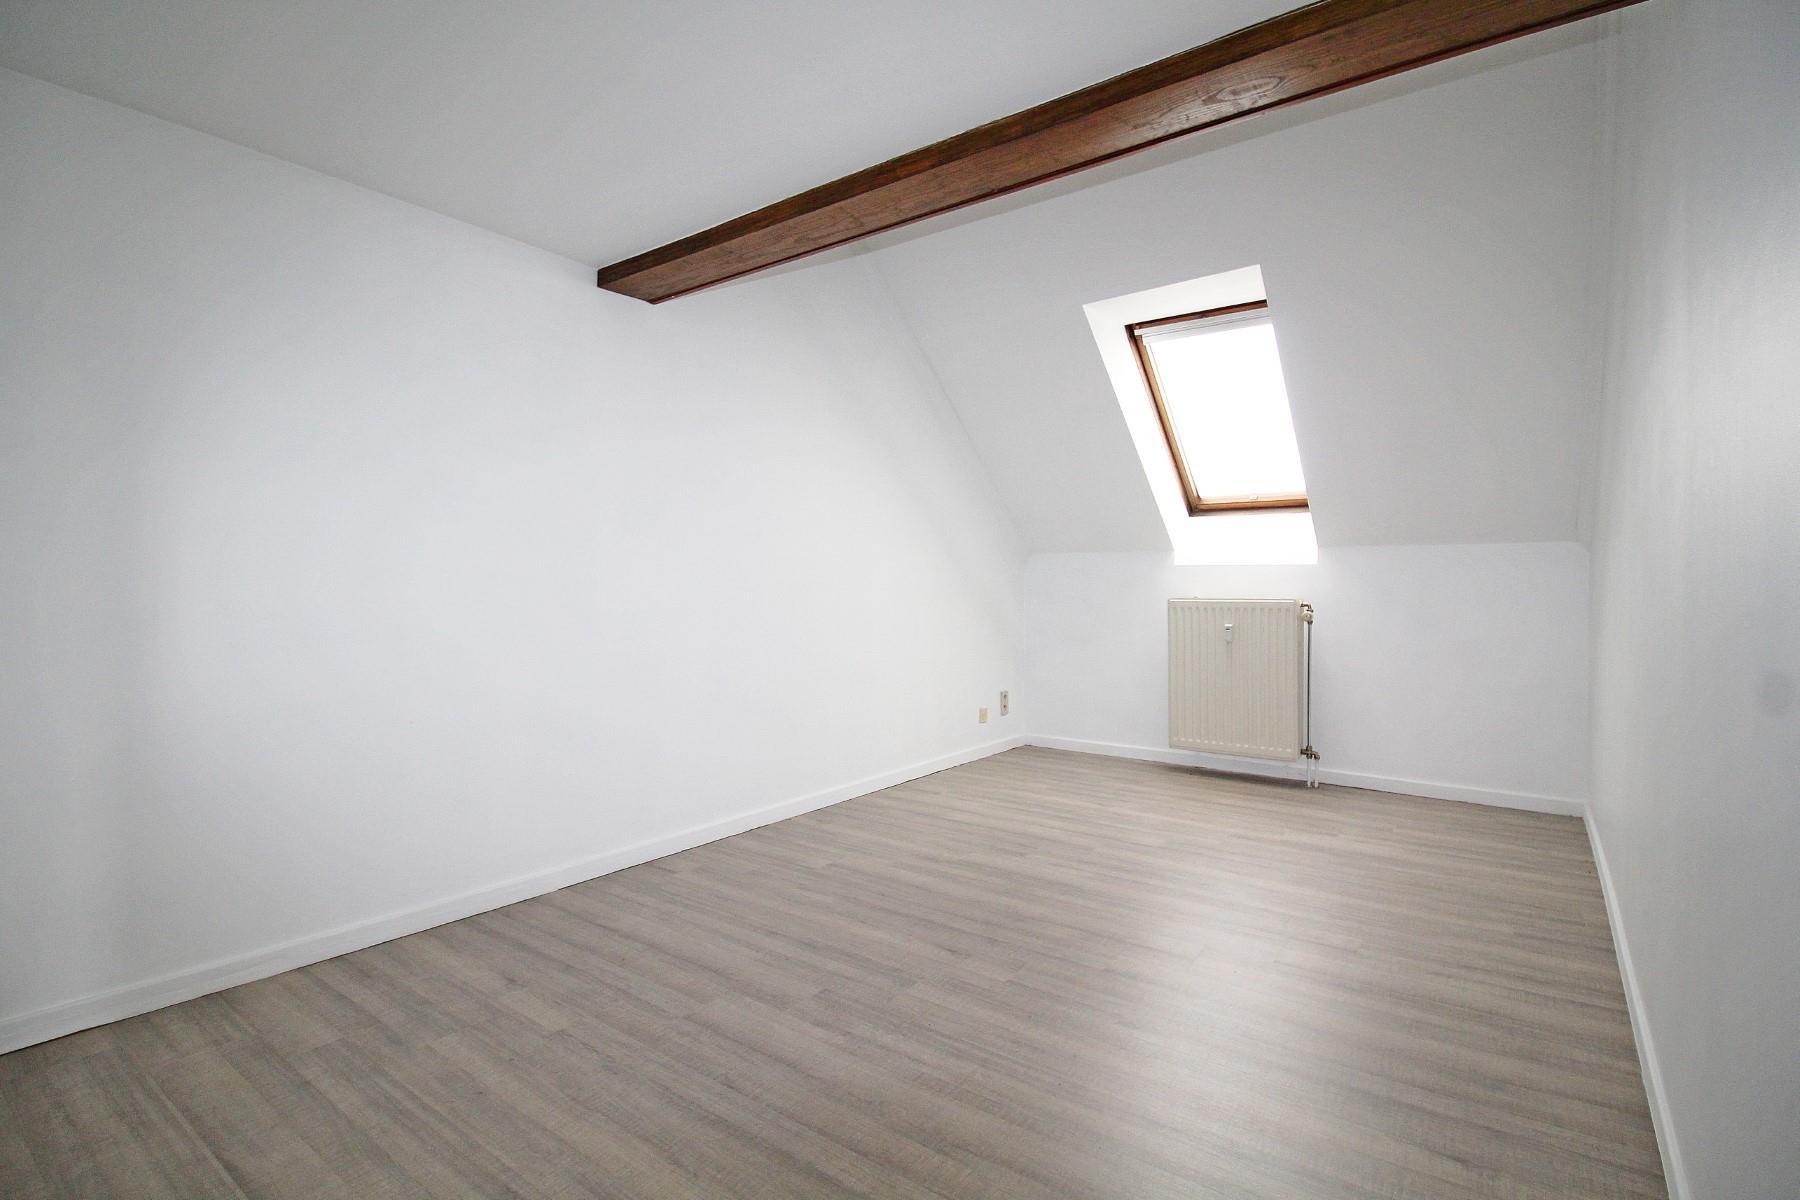 Appartement - Eghezée - #4140908-6